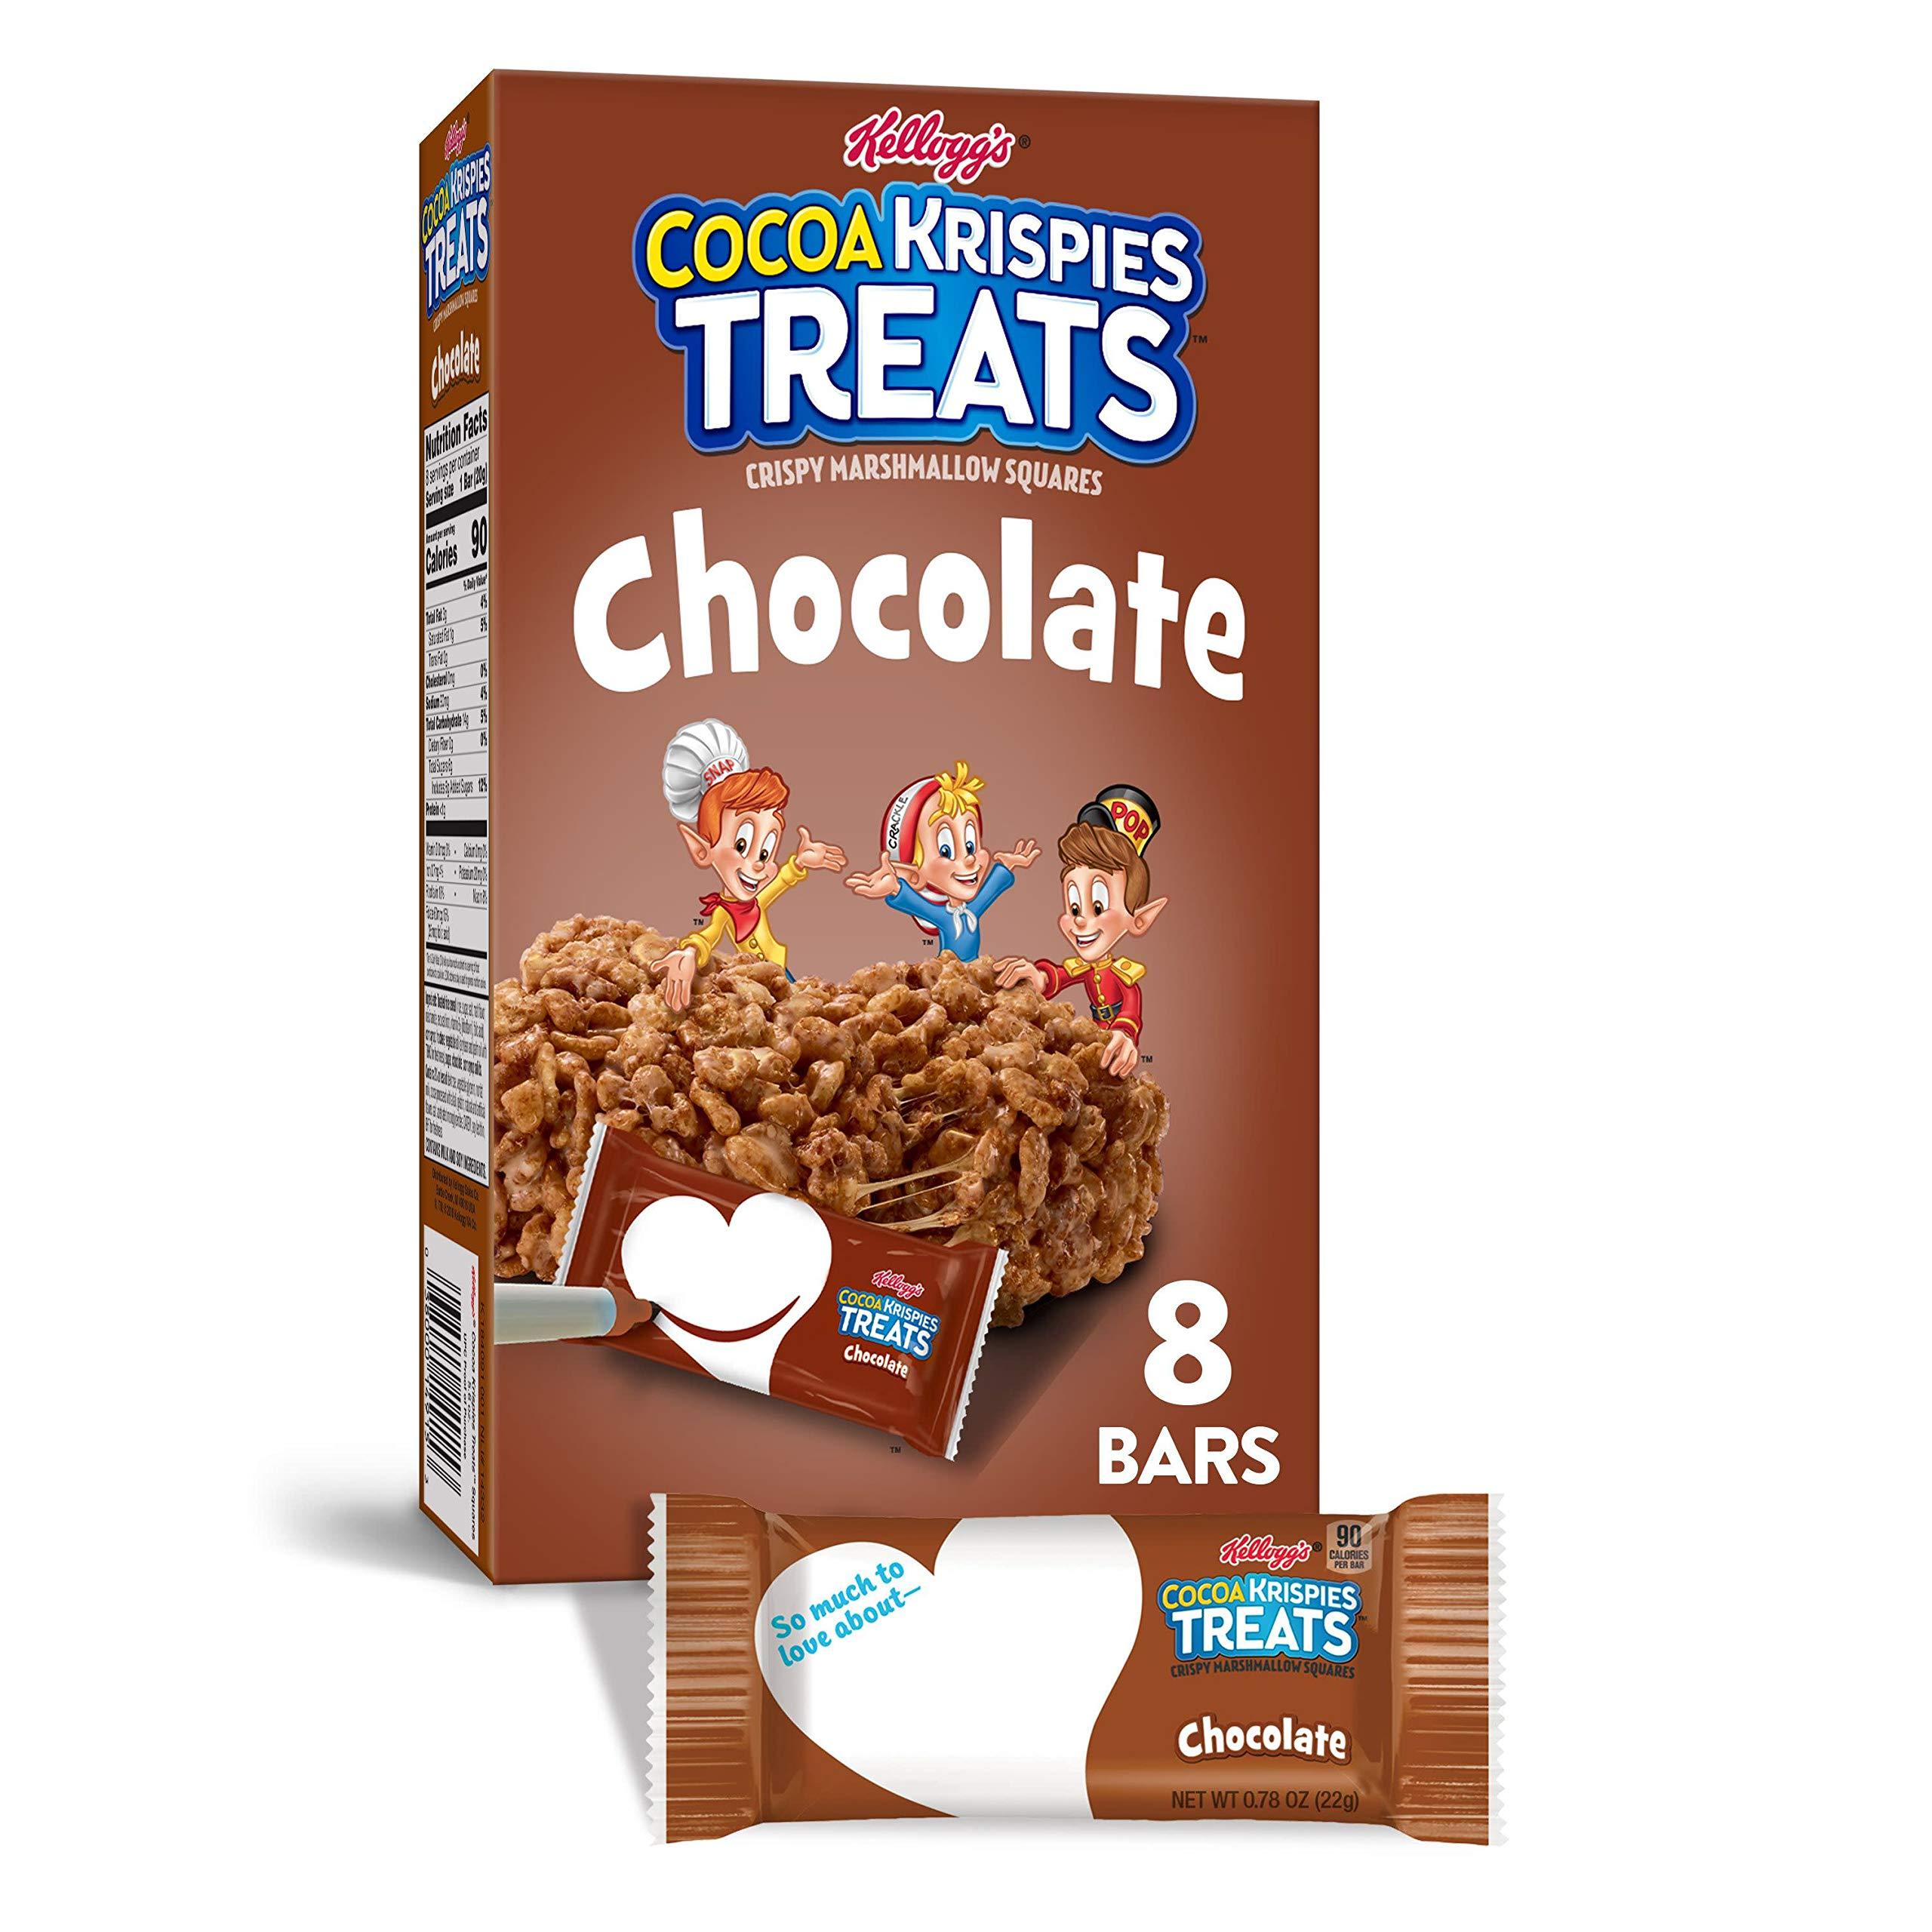 Kellogg's Cocoa Krispies Treats, Crispy Marshmallow Squares, Chocolate, 5.6oz Box (8 Count)